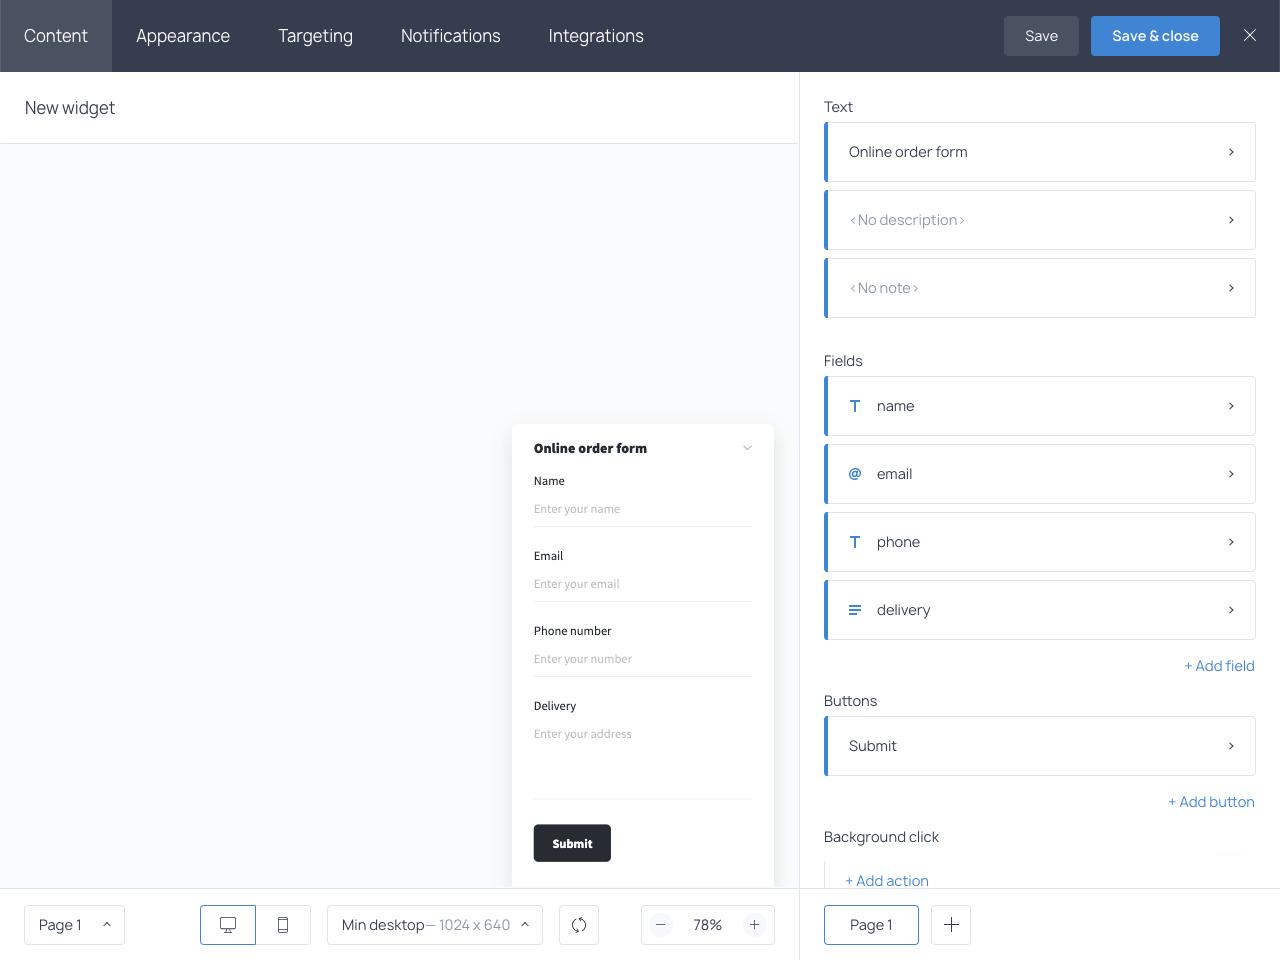 How to create a custom online order form in Getsitecontrol